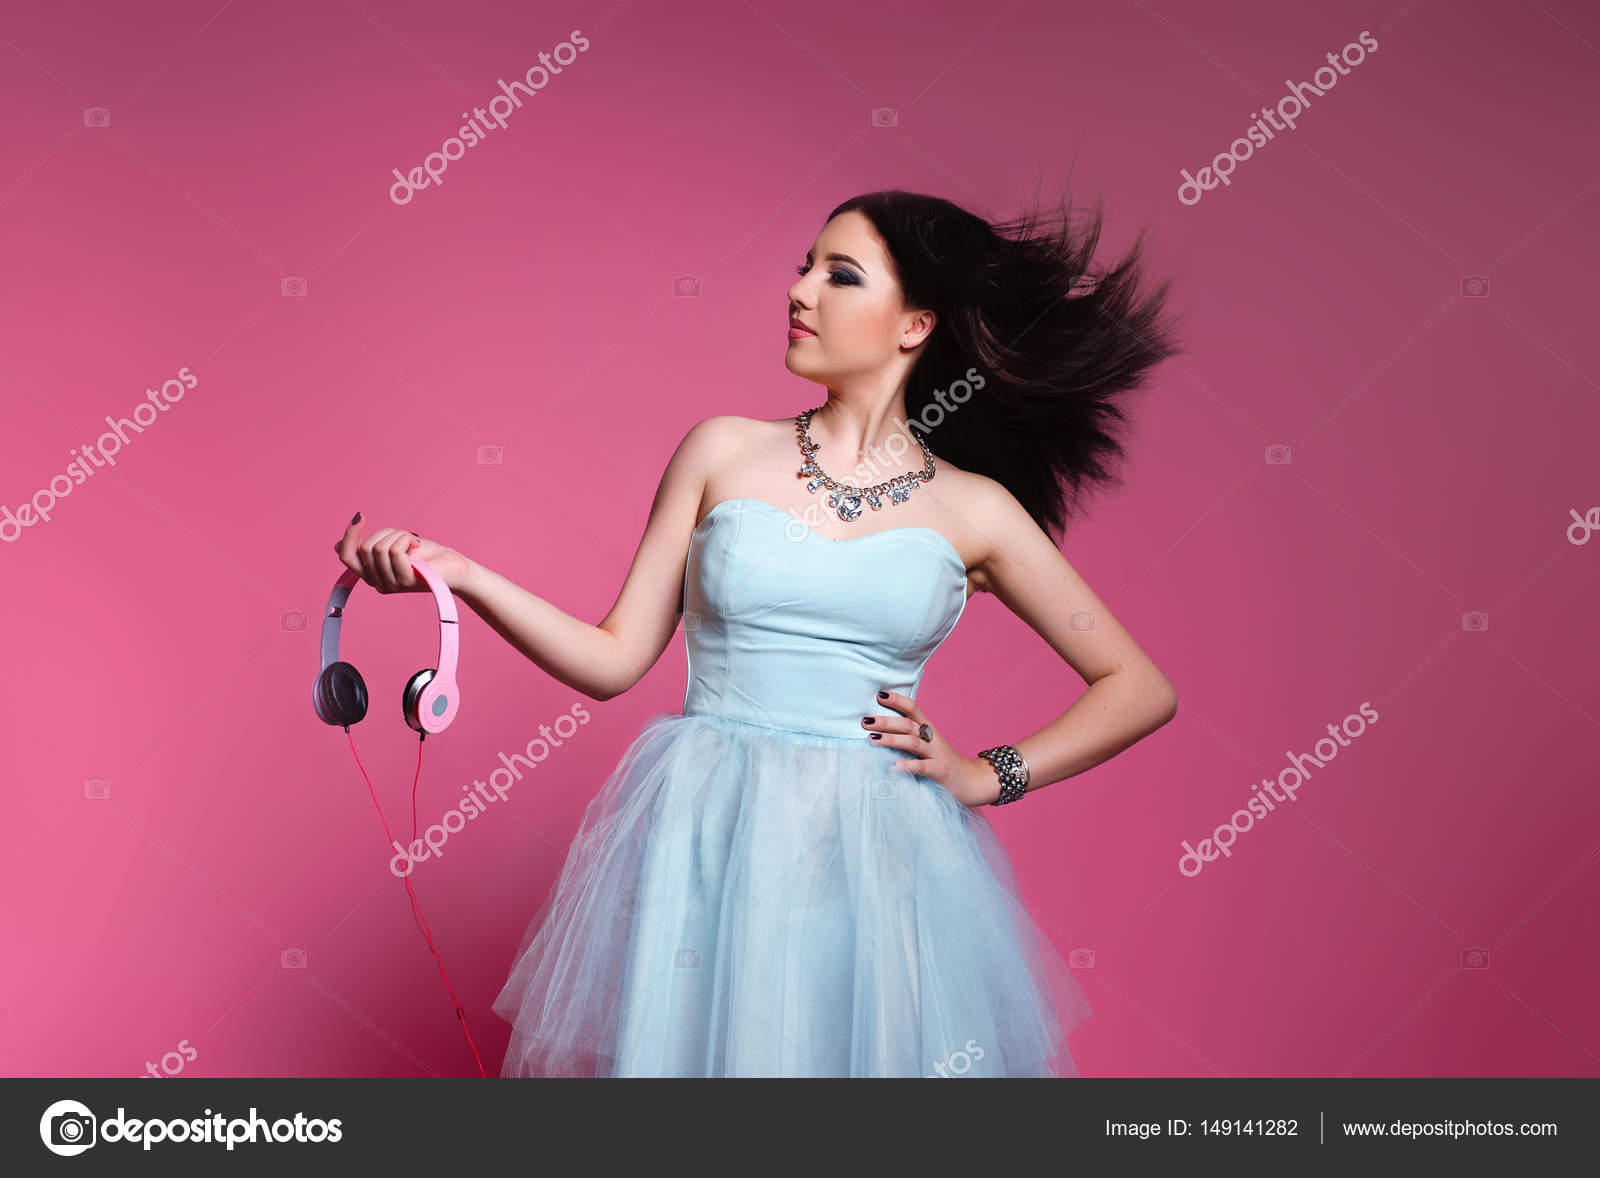 Morenas de moda sobre fondo rosa. chica en un vestido azul con ...